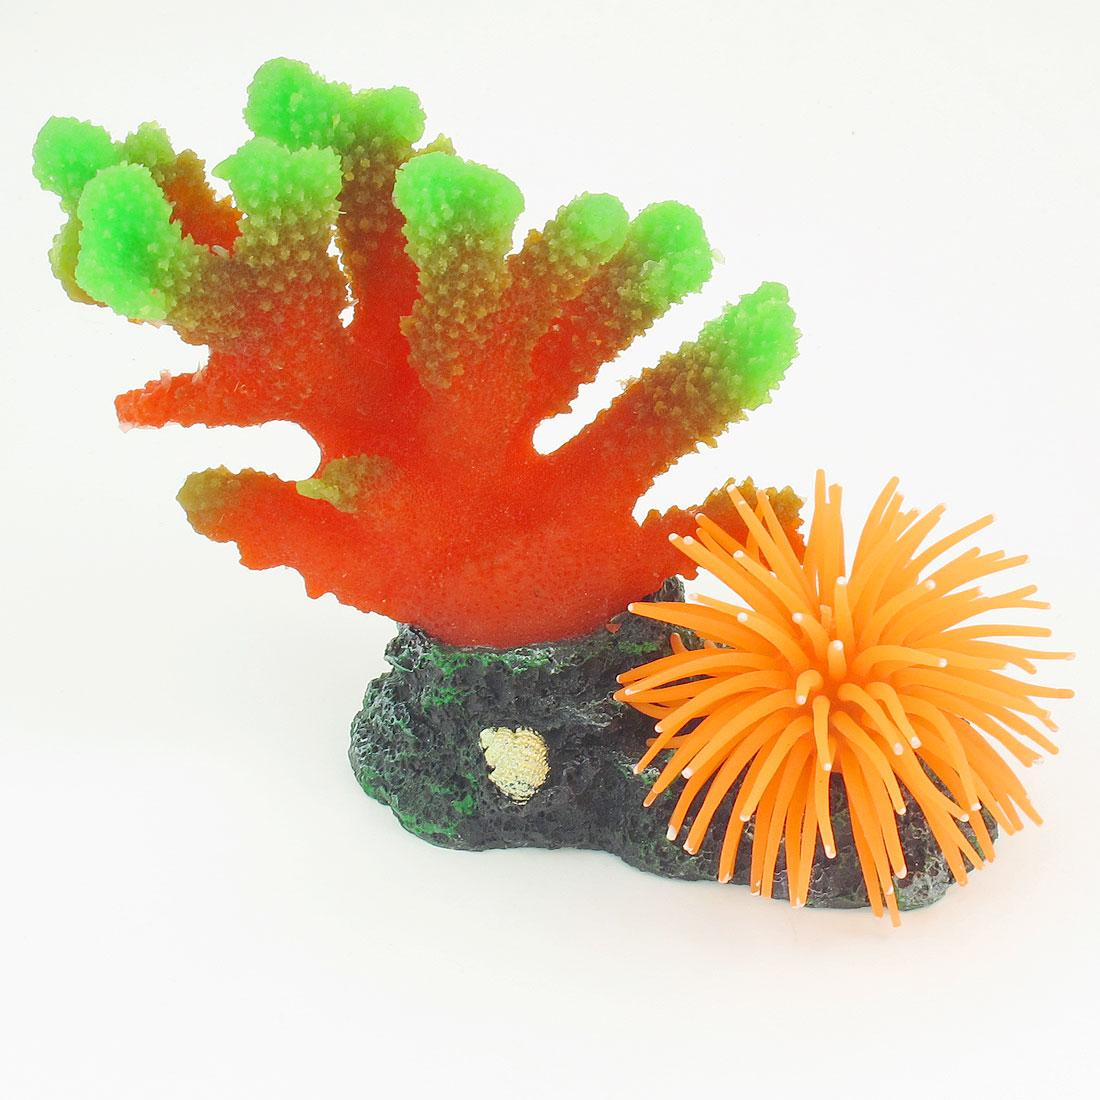 "5.3"" High Aquarium Red Orange Artificial Silicone Coral Ornament"